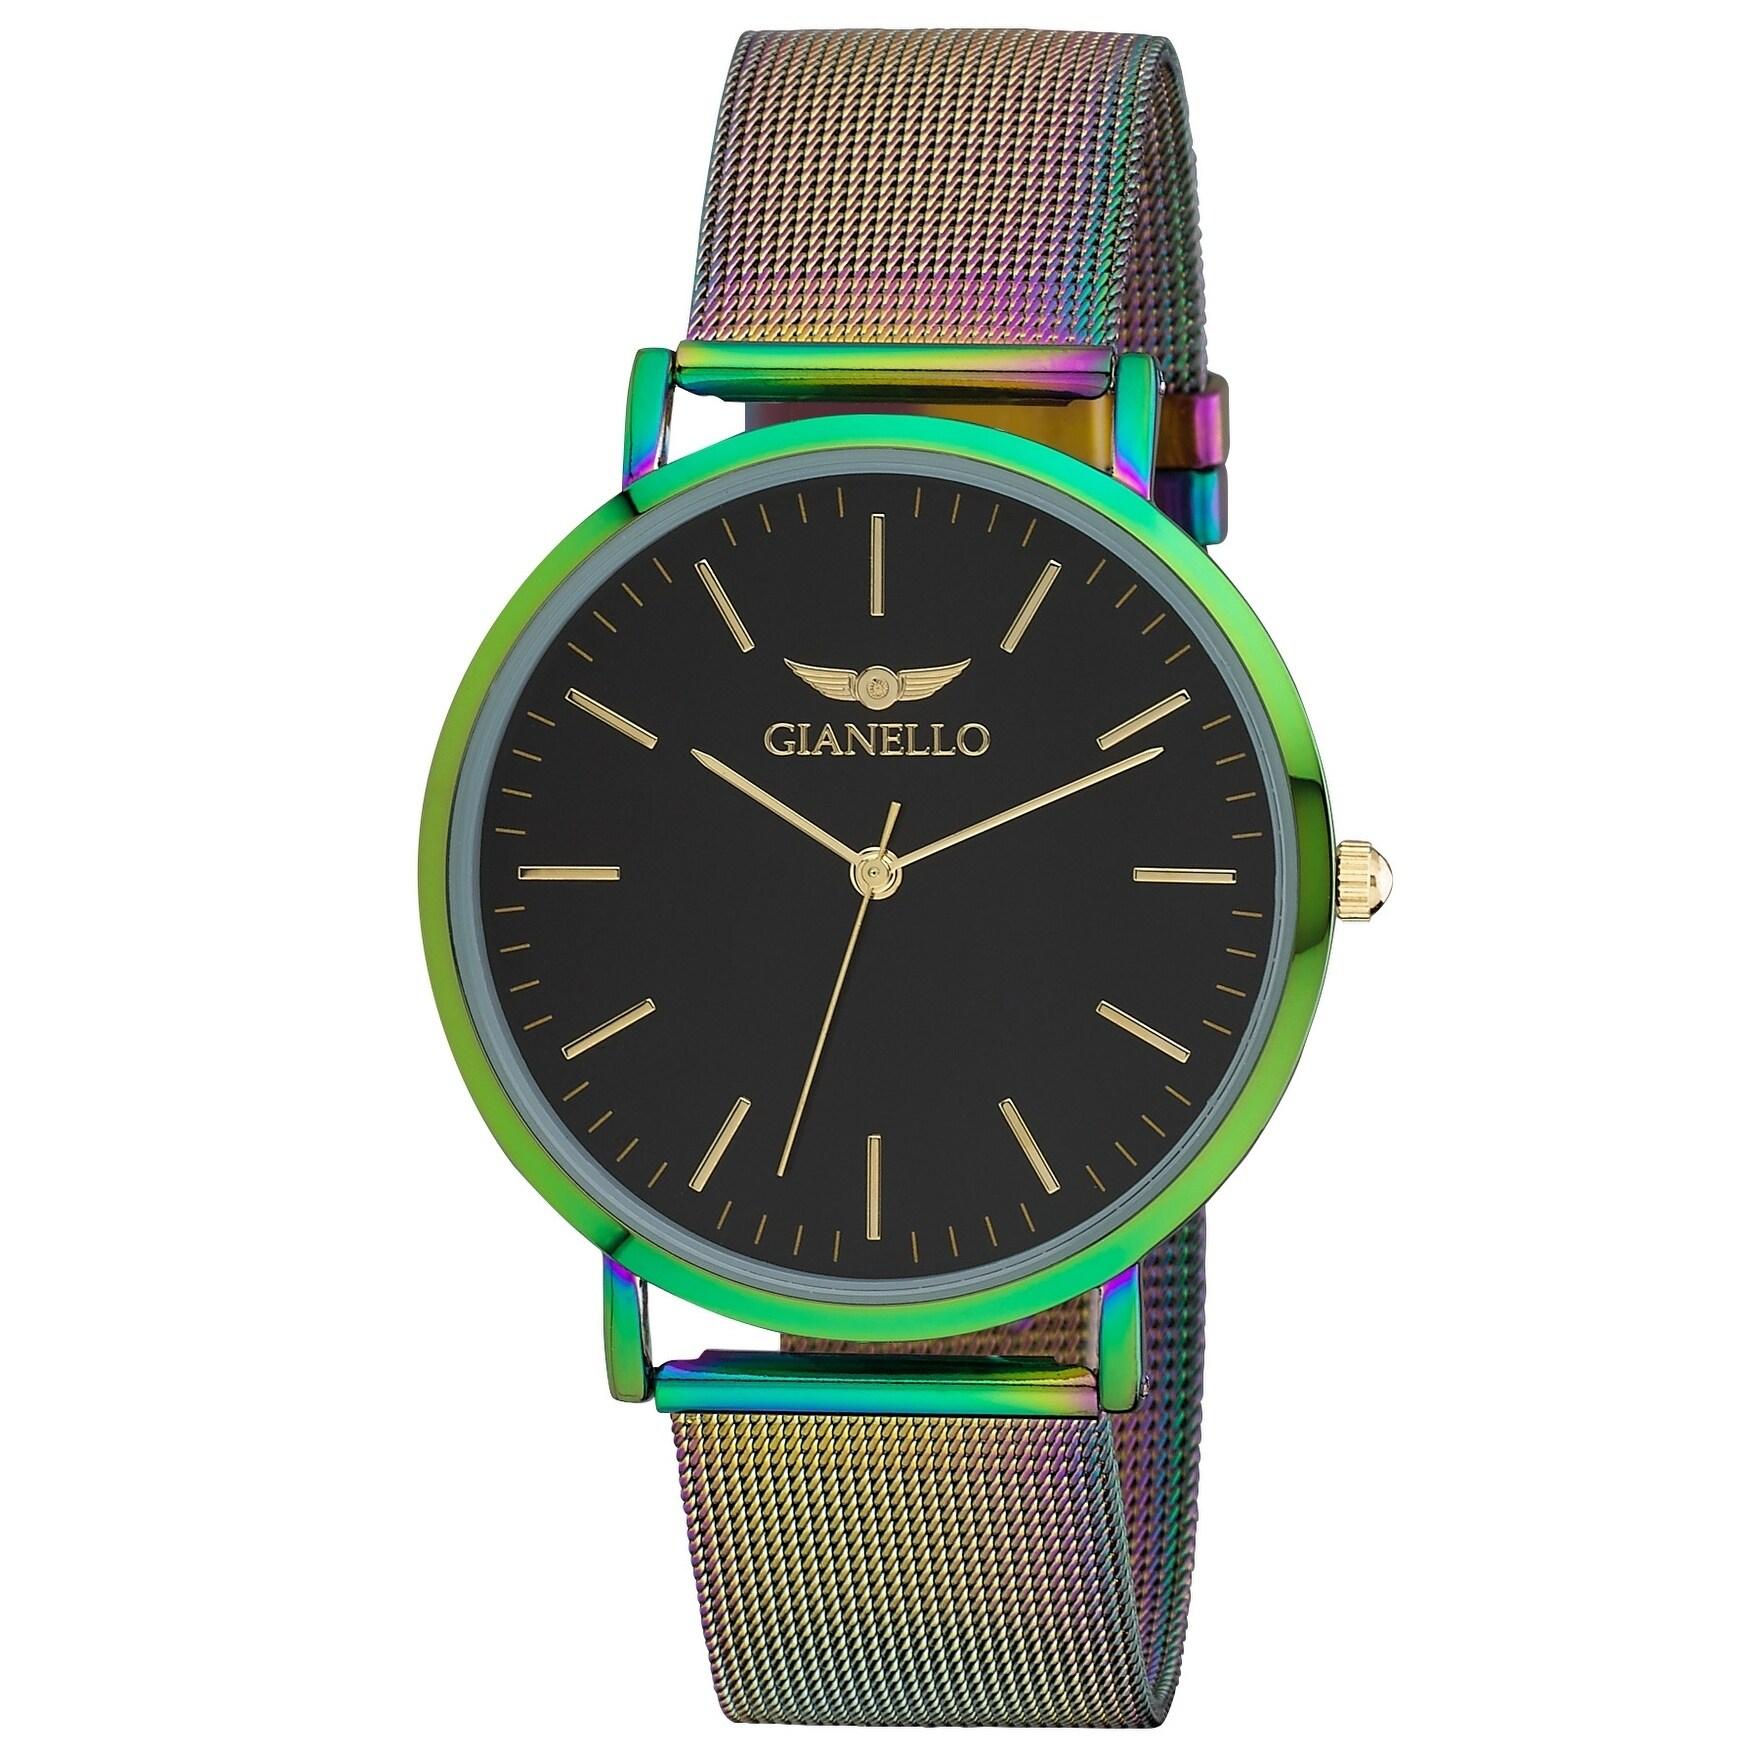 Gianello Gnl7722tg Oil Silk Stainless Steel Slim Case Mesh Bracelet Watch One Size